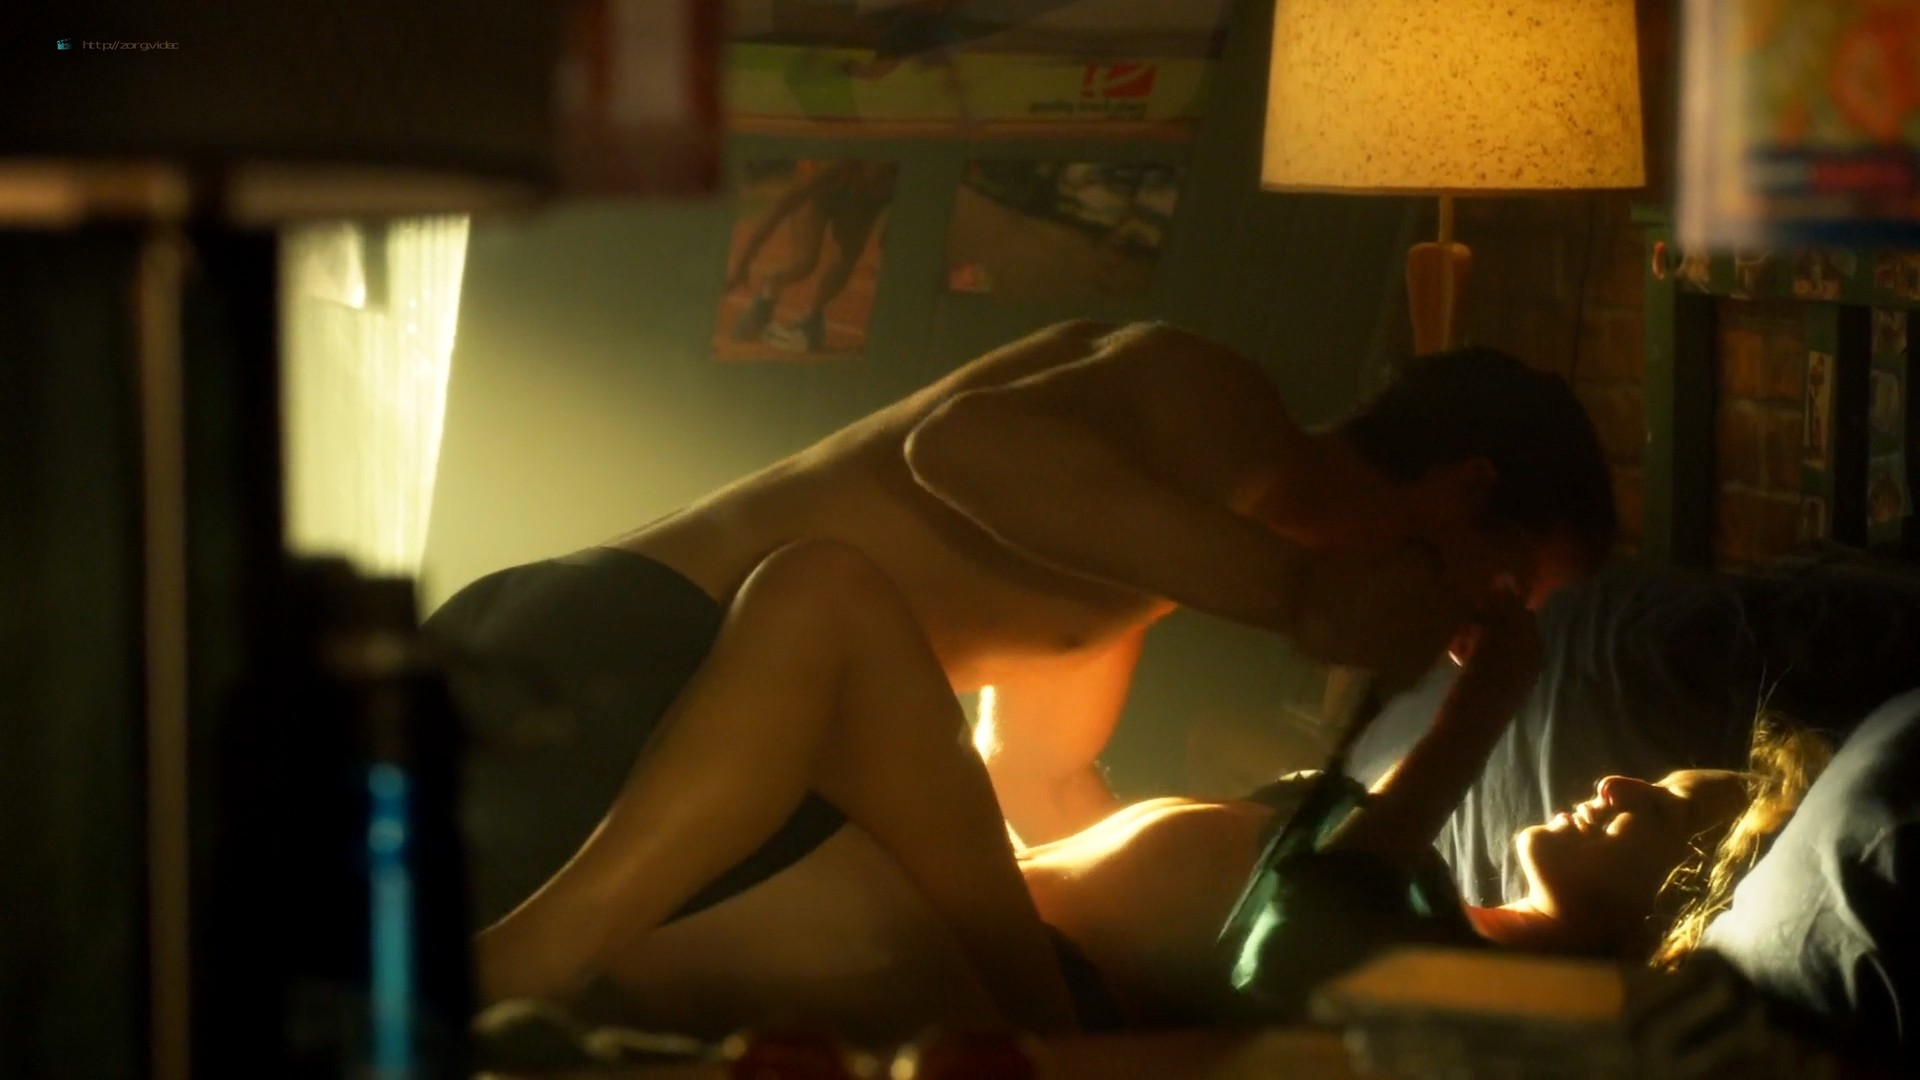 Alexa Vega hot and some sex - The Tomorrow People (2014) s1e18-19 HD (9)